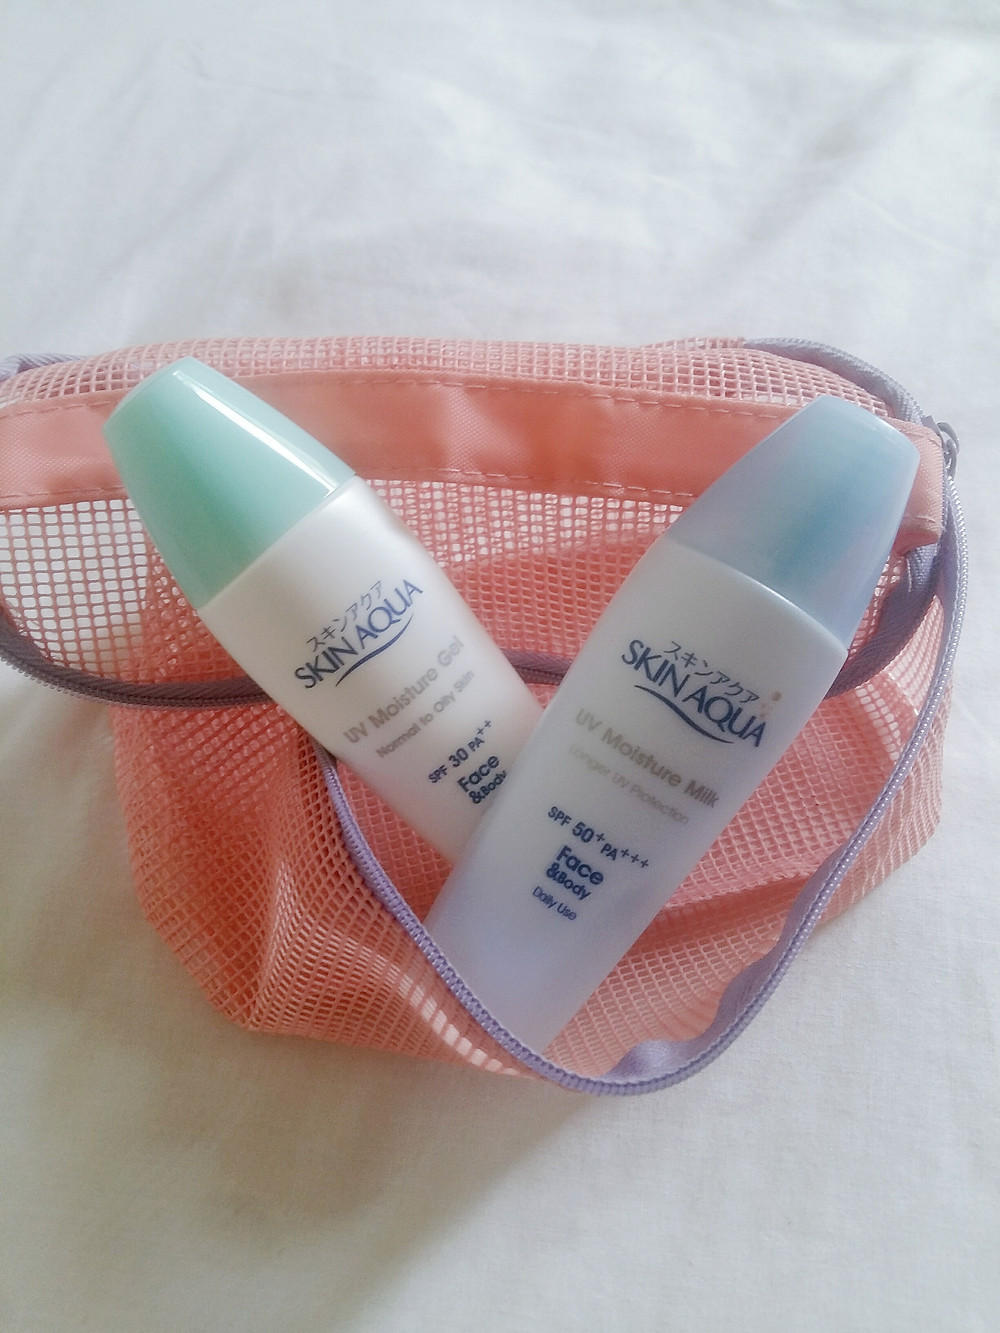 Review Skin Aqua Indonesia